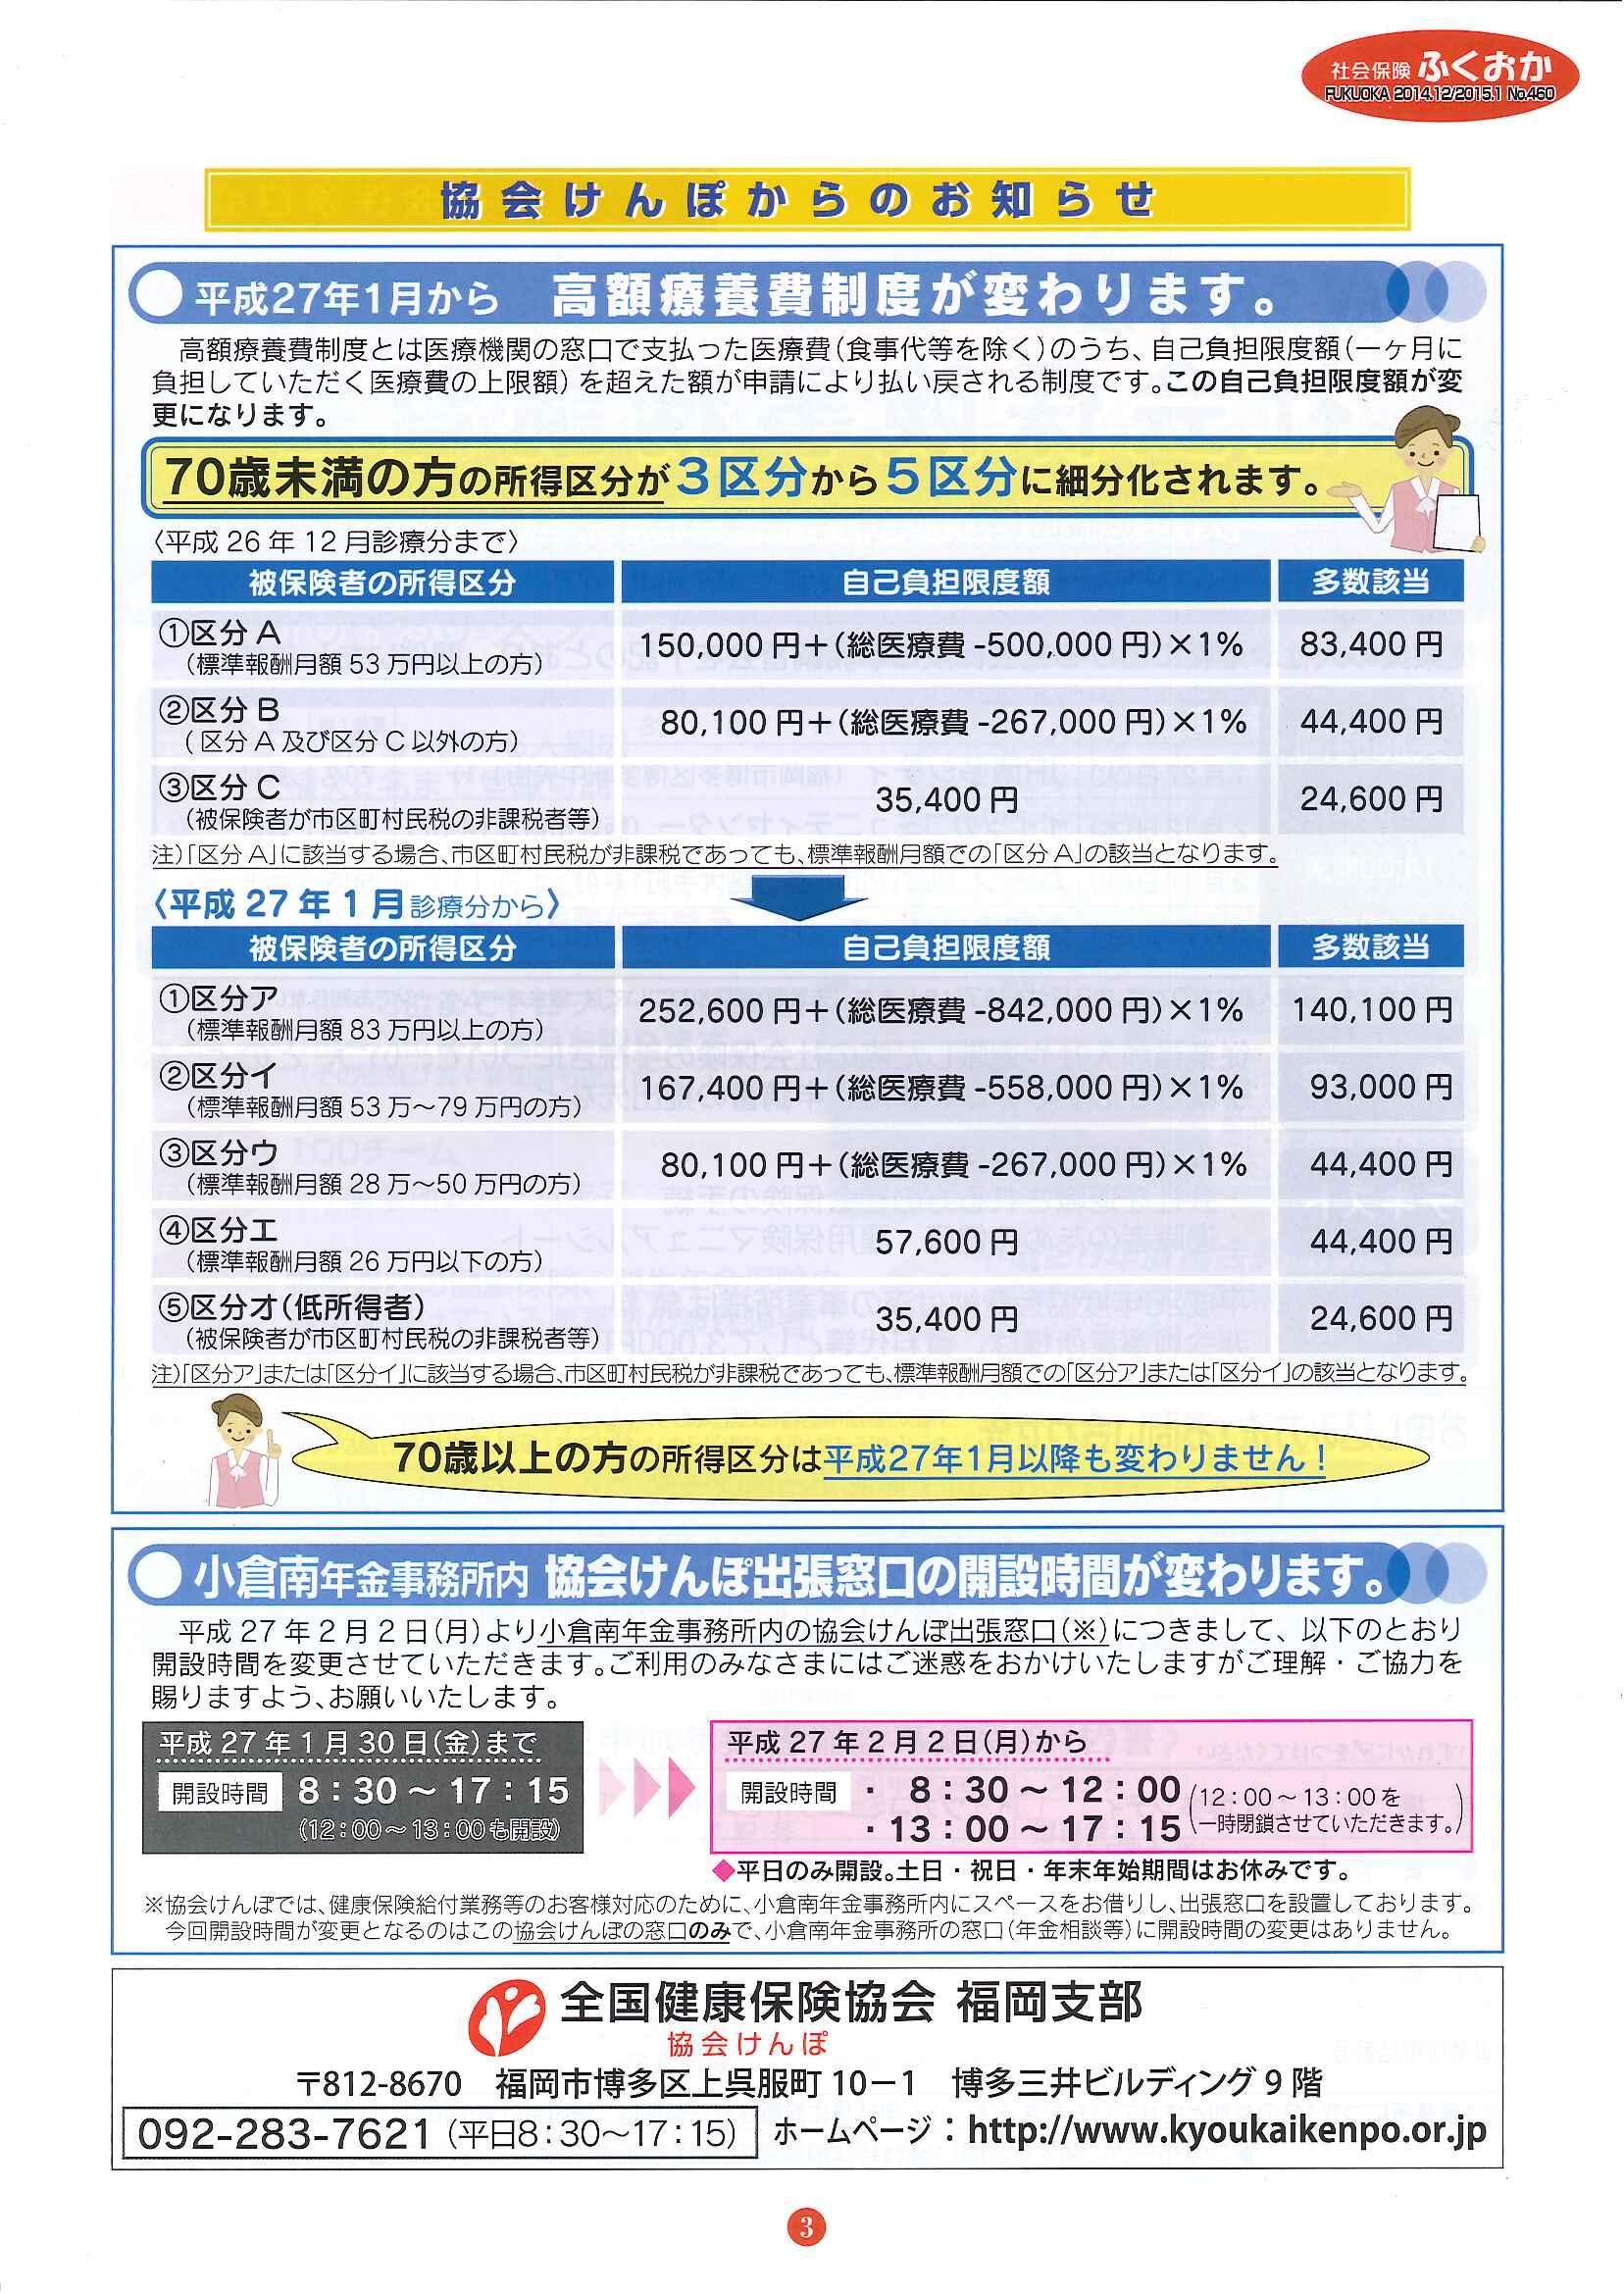 H27年1月予定/社会保険「ふくおか」/年末年始事務局休み_f0120774_1255419.jpg